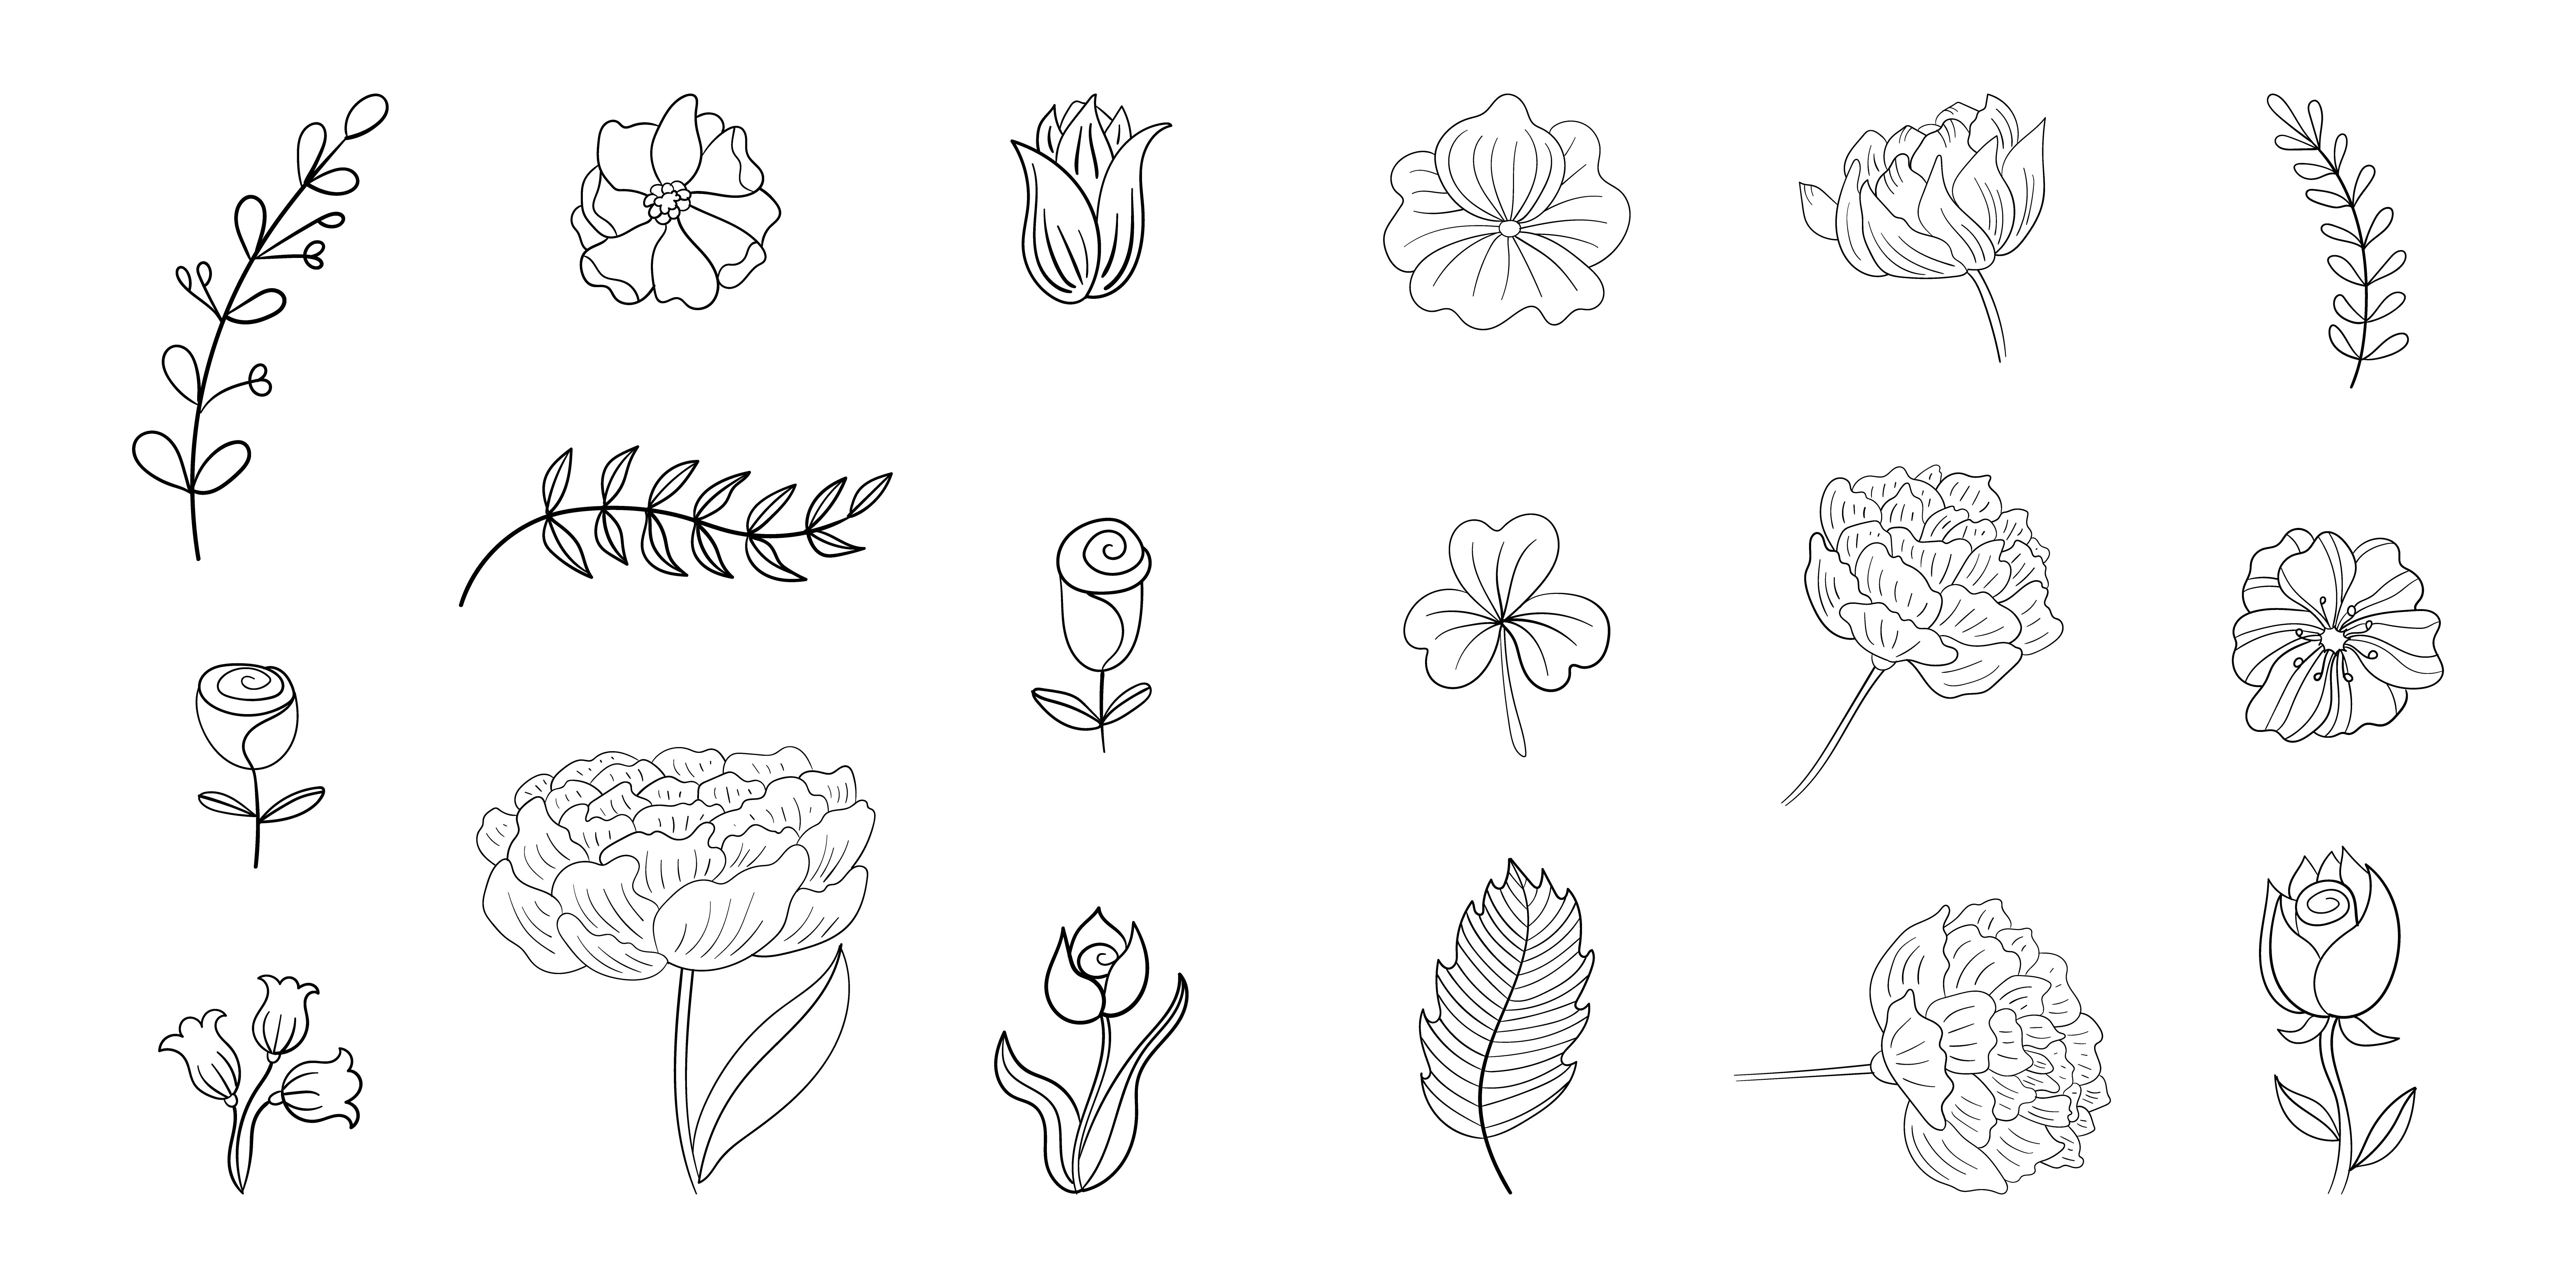 Set Of Simple Flower Line Doodles Download Free Vectors Clipart Graphics Vector Art